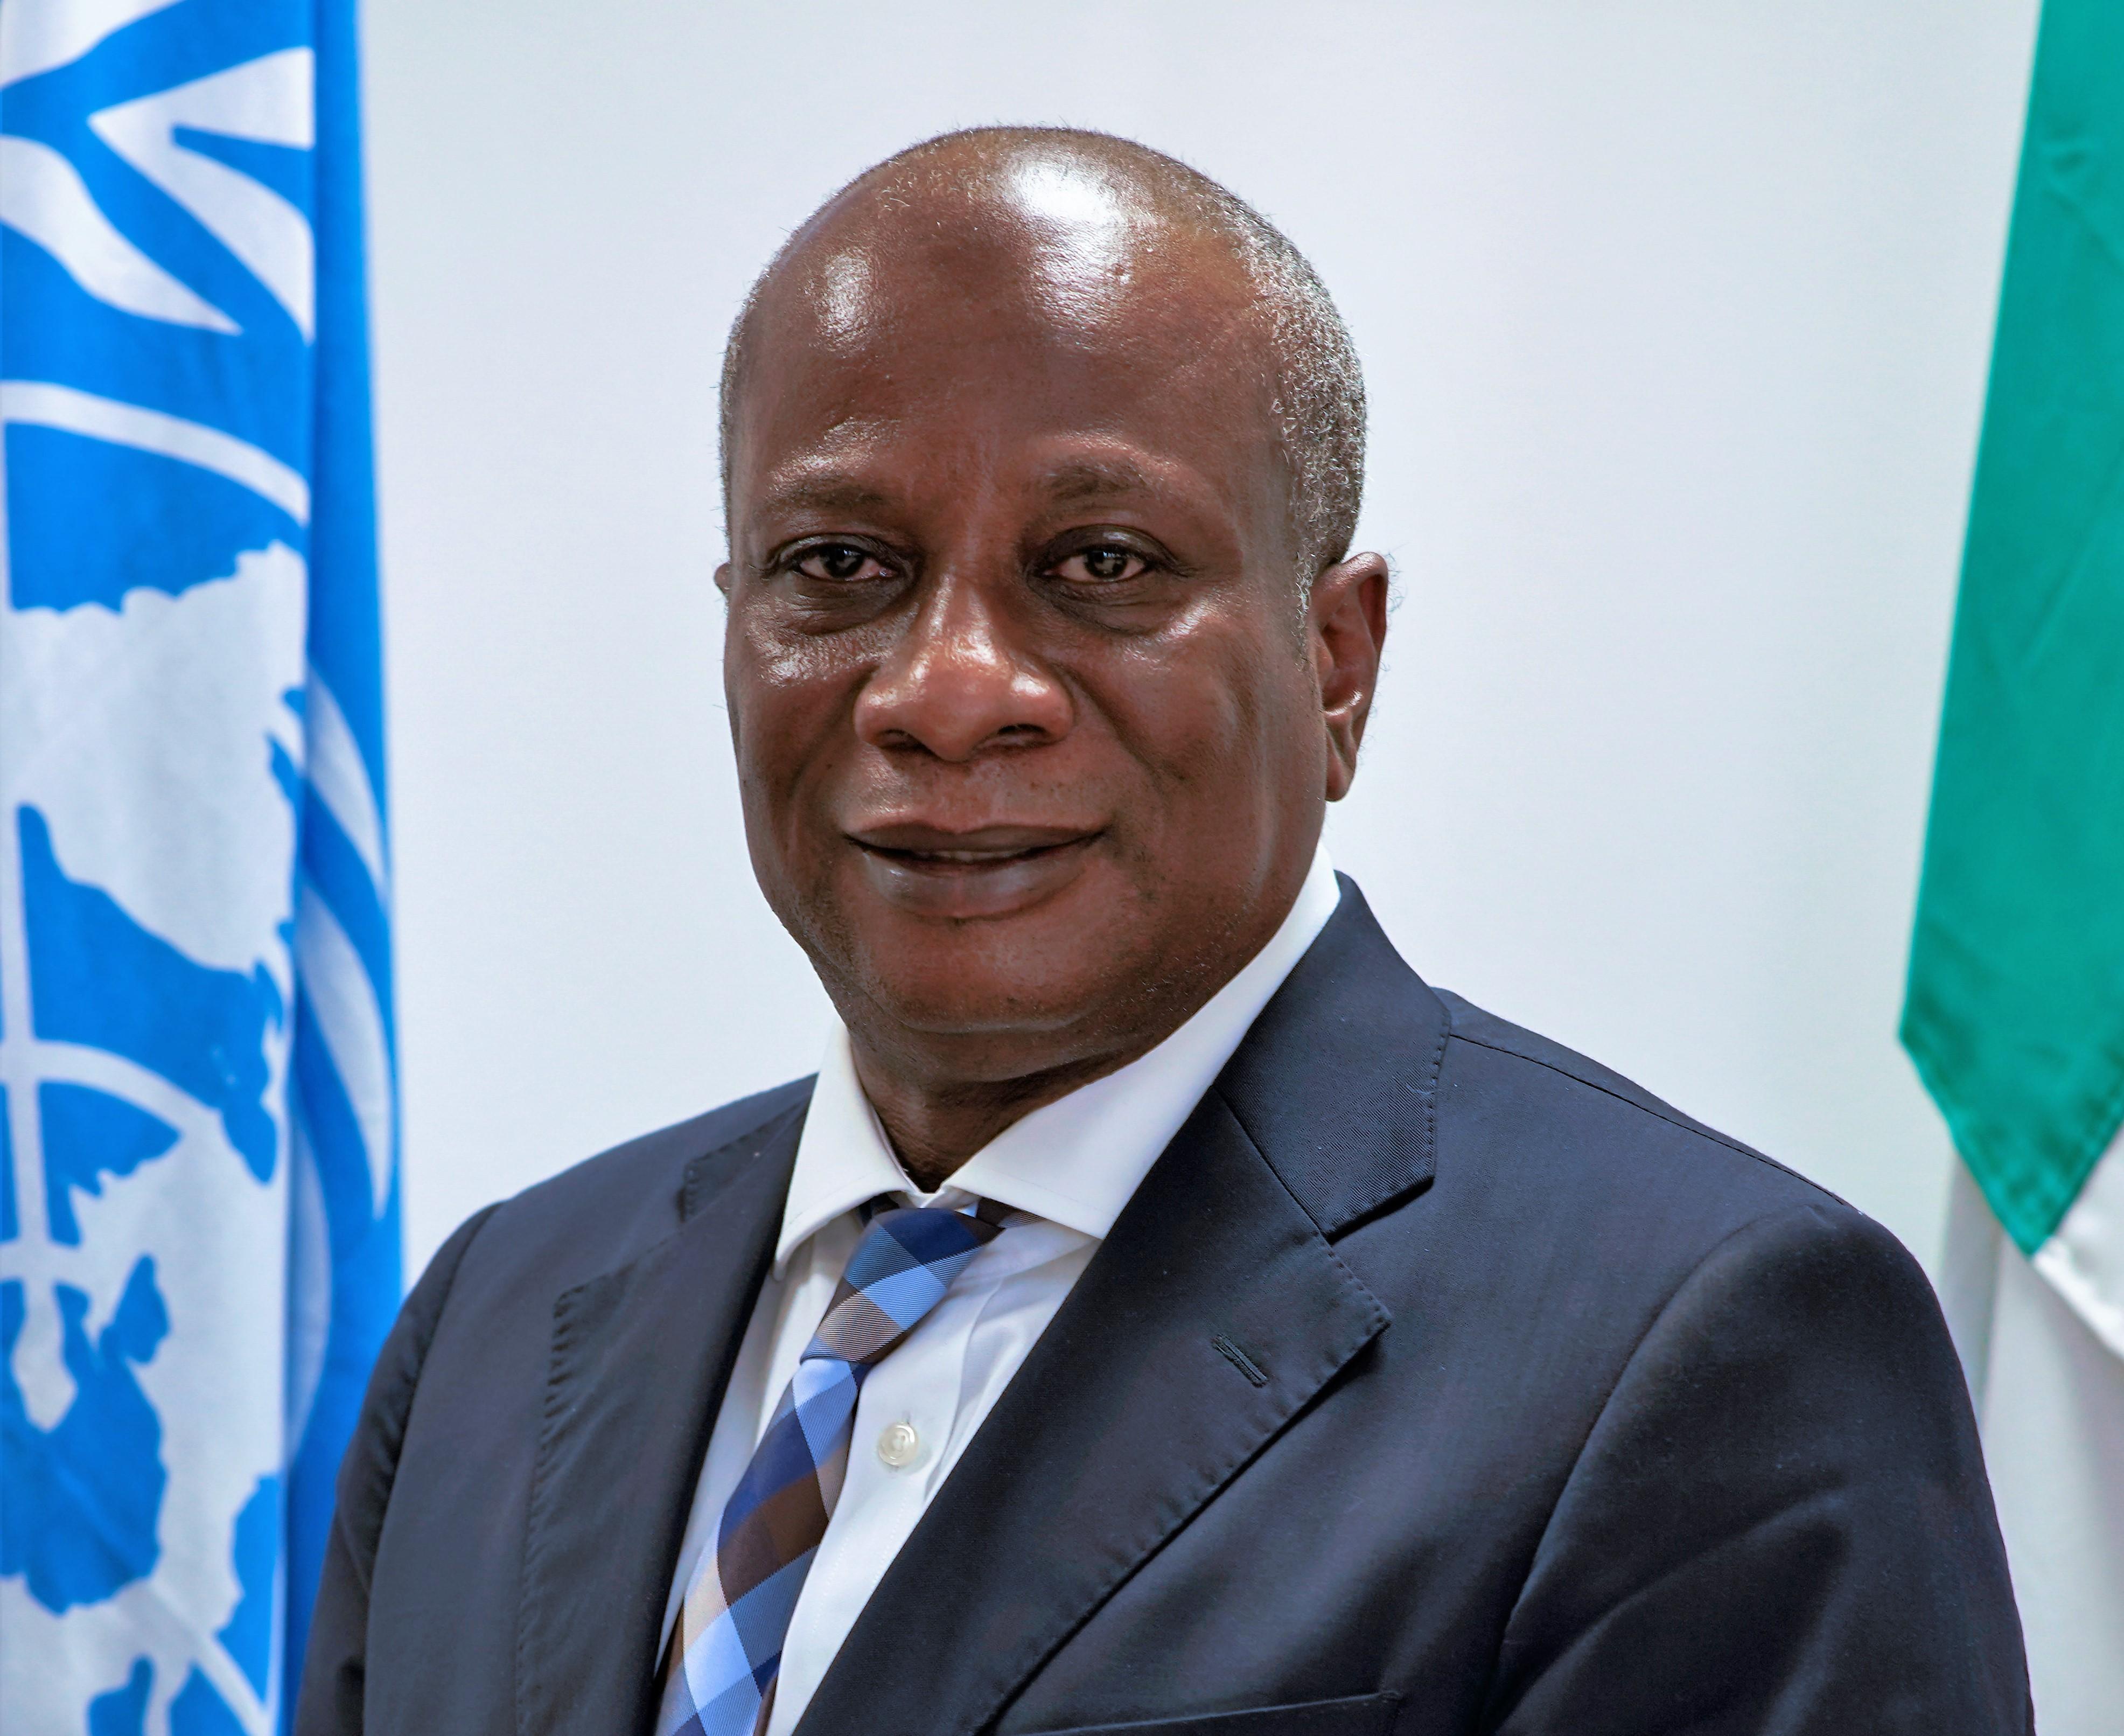 UN Resident and Humanitarian Coordinator